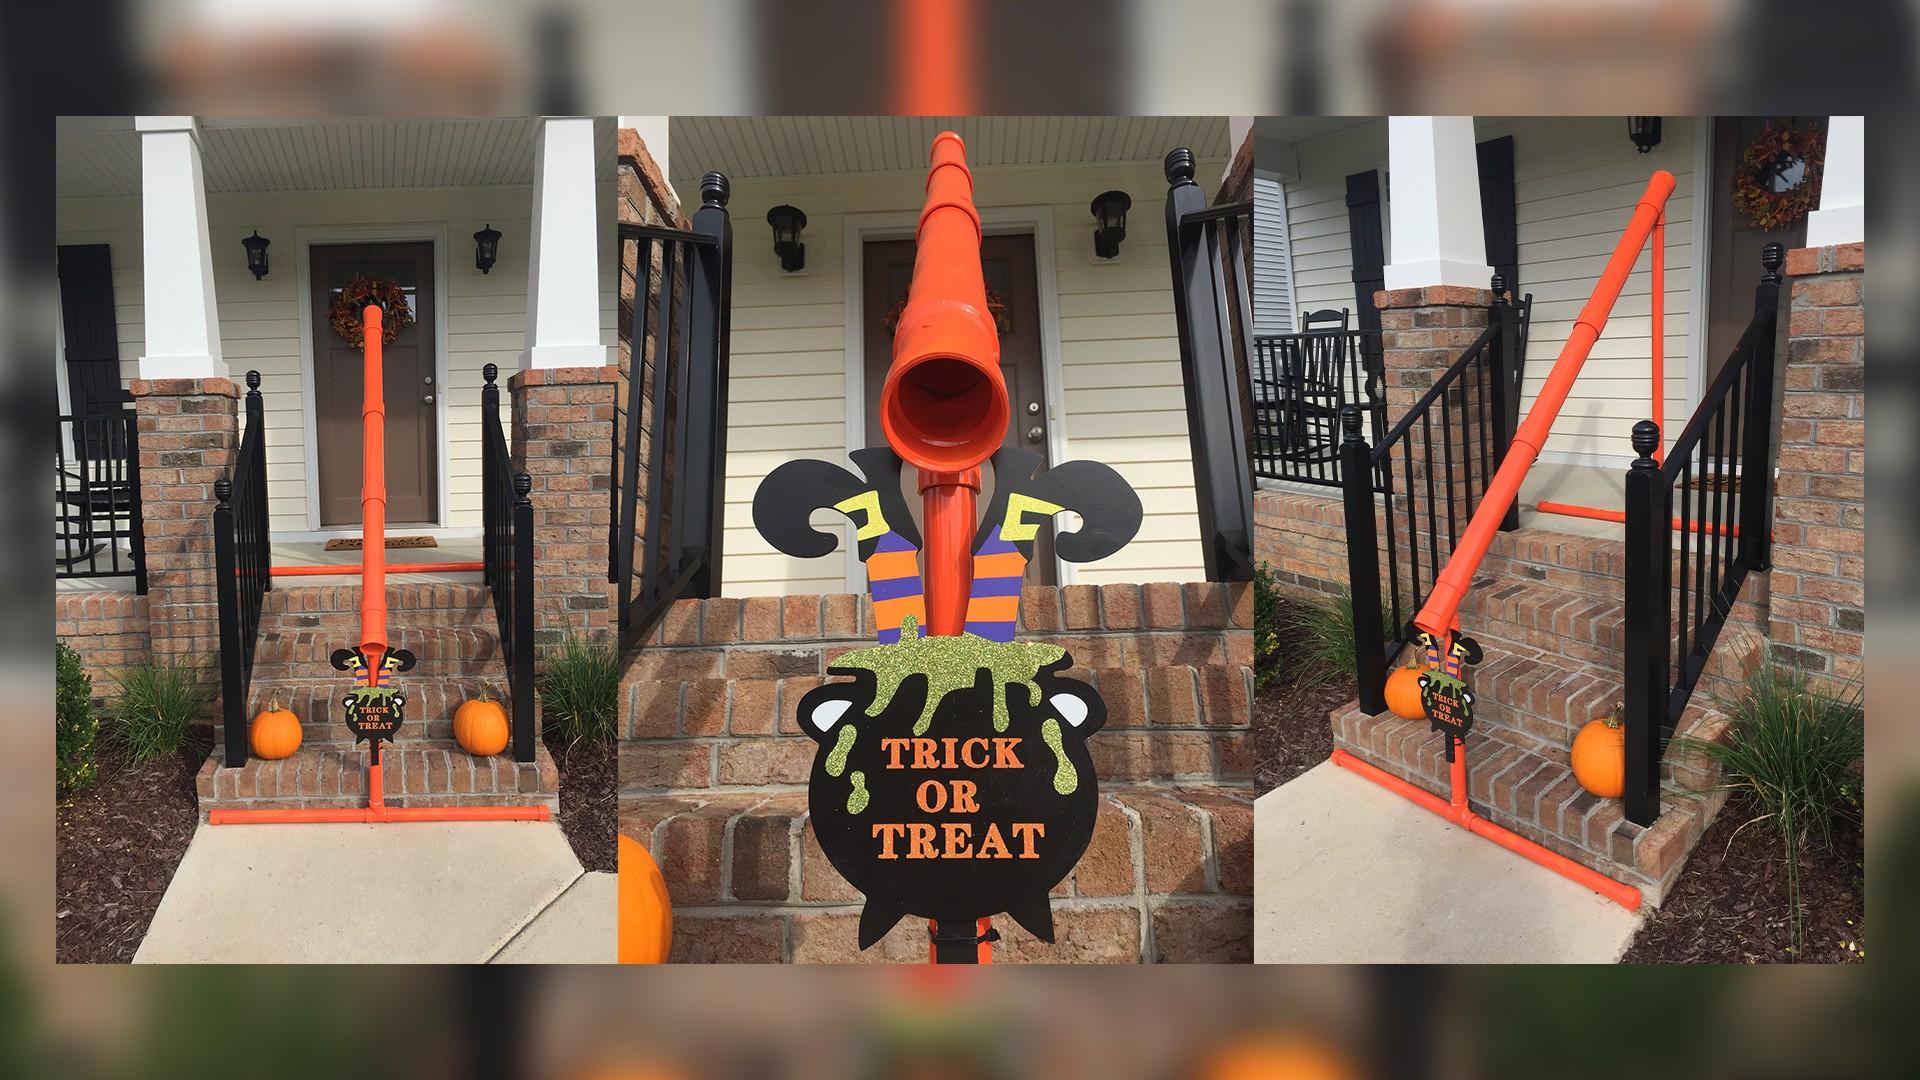 Virginia Tech Halloween 2020 Virginia Tech graduates' Halloween candy slide goes viral